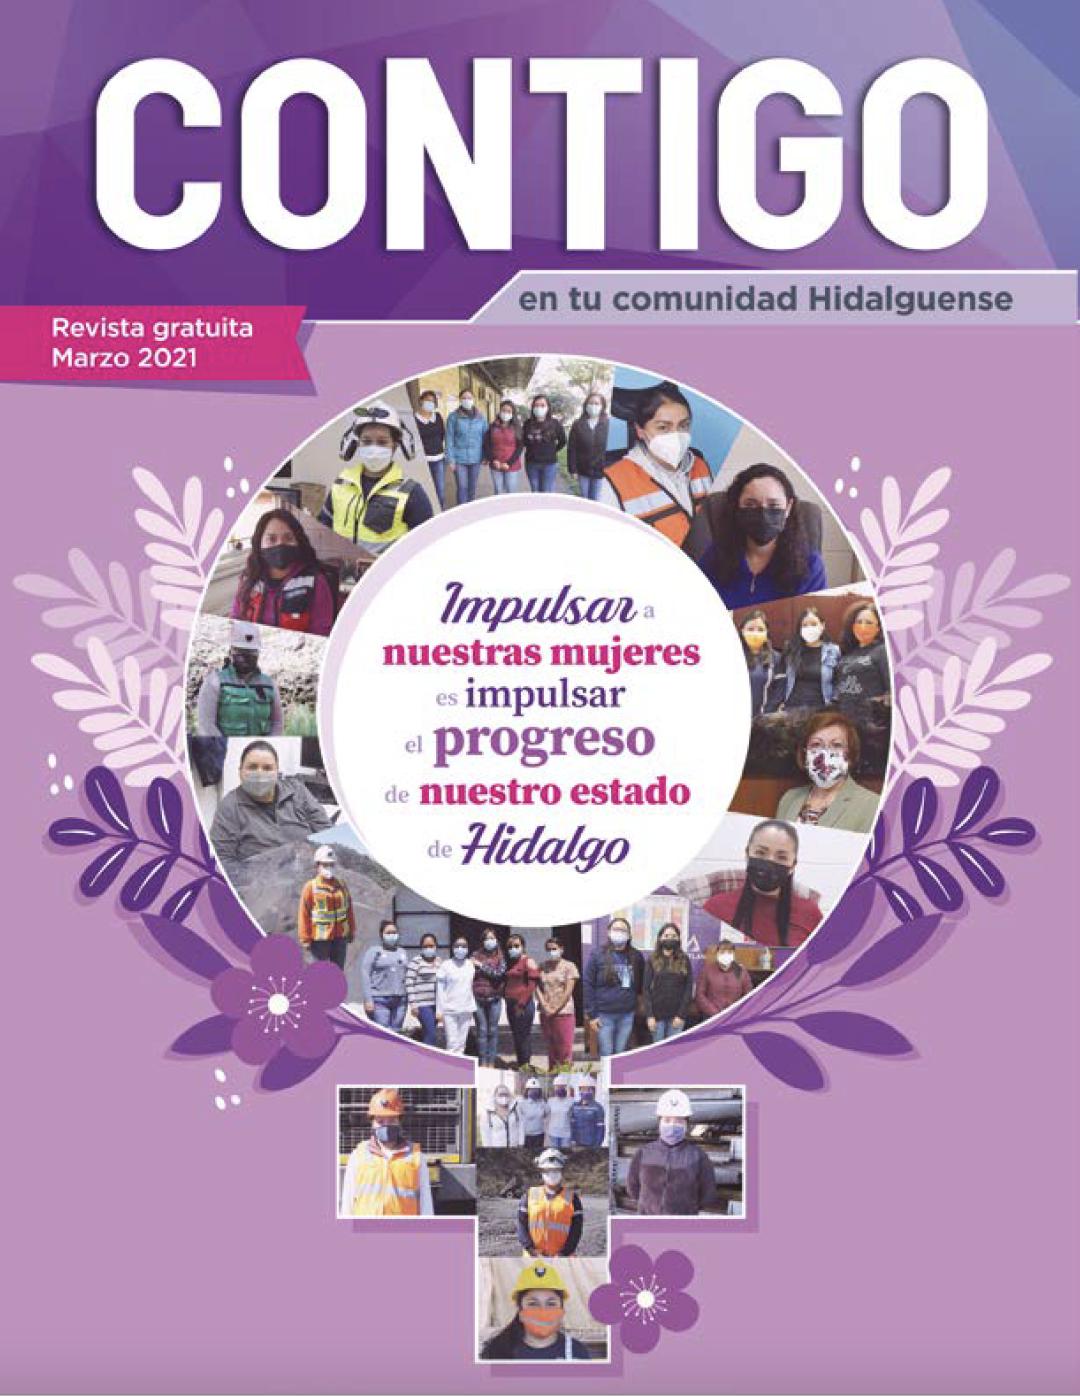 https://comunidadesautlan.com/wp-content/uploads/2021/04/Portada-Revista-contigo-marzo-2021.png